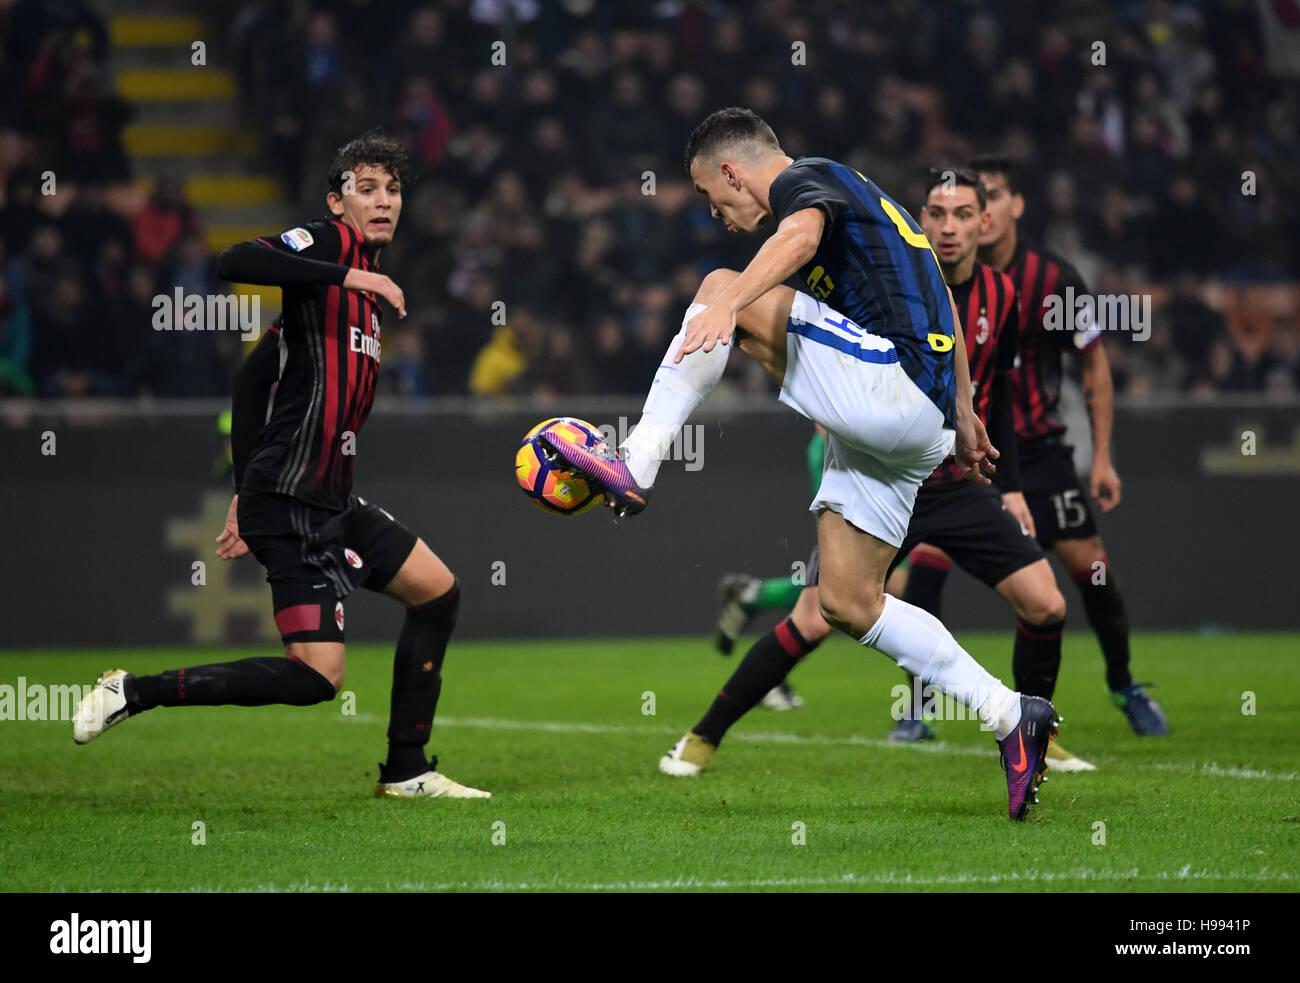 Milan. 20th Nov, 2016. Inter Milan's Ivan Perisic scores during the Italian Serie A football match between AC Milan Stock Photo